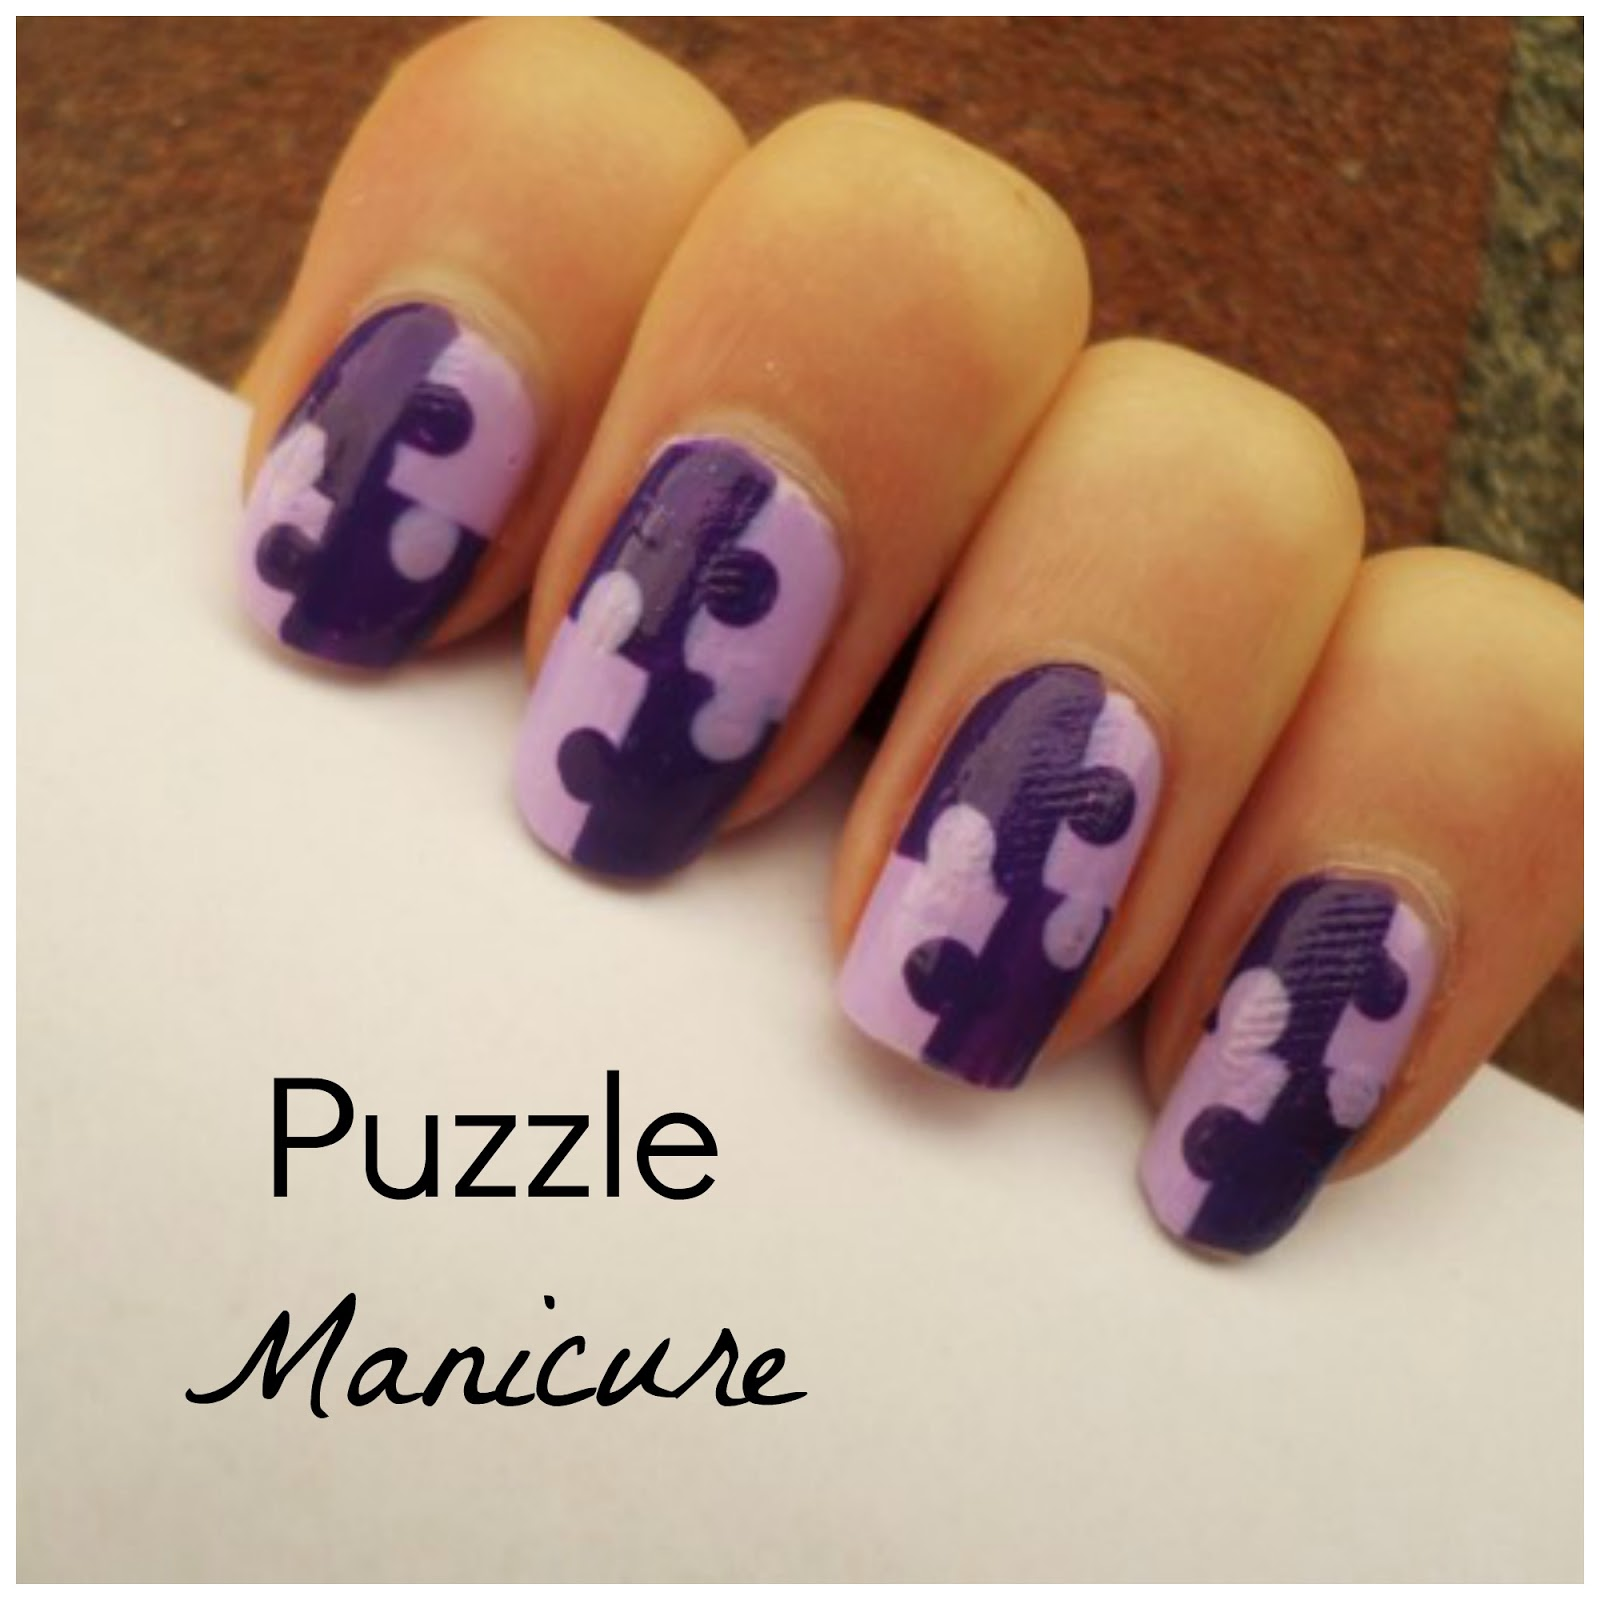 Creativenails4fun: ~Nail art~ Puzzle manicure!